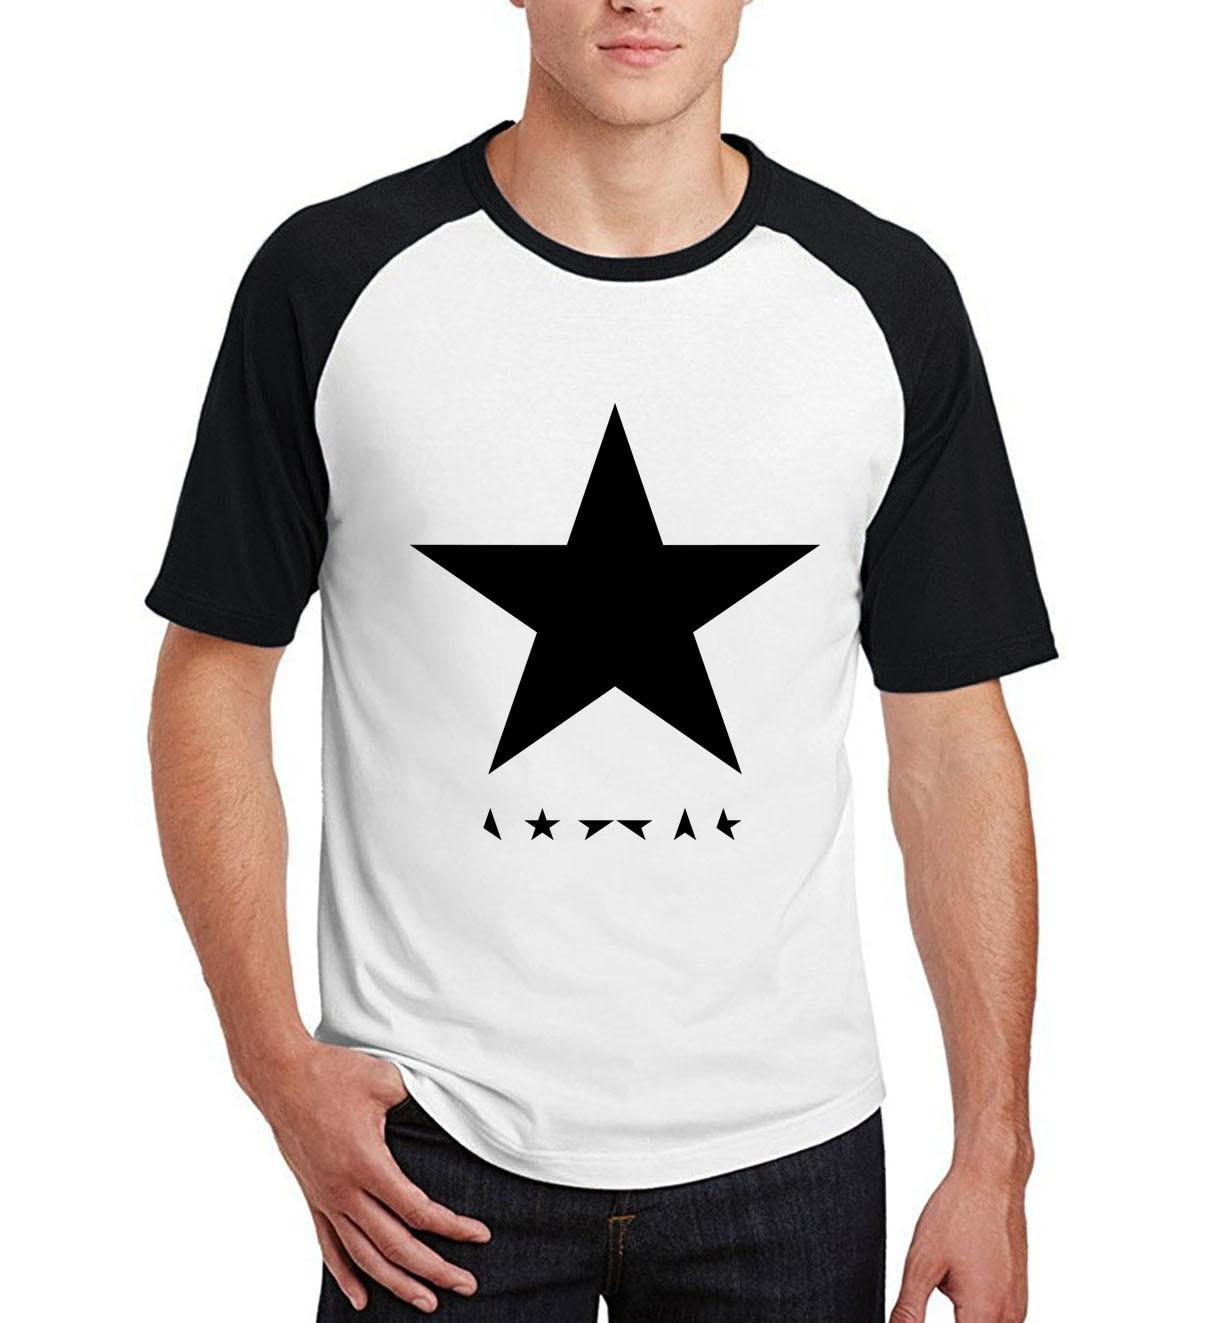 fashion hip-hop clothing brand tops 2019 summer funny star print t shirt raglan cotton o-neck men short sleeve fitness camisetas